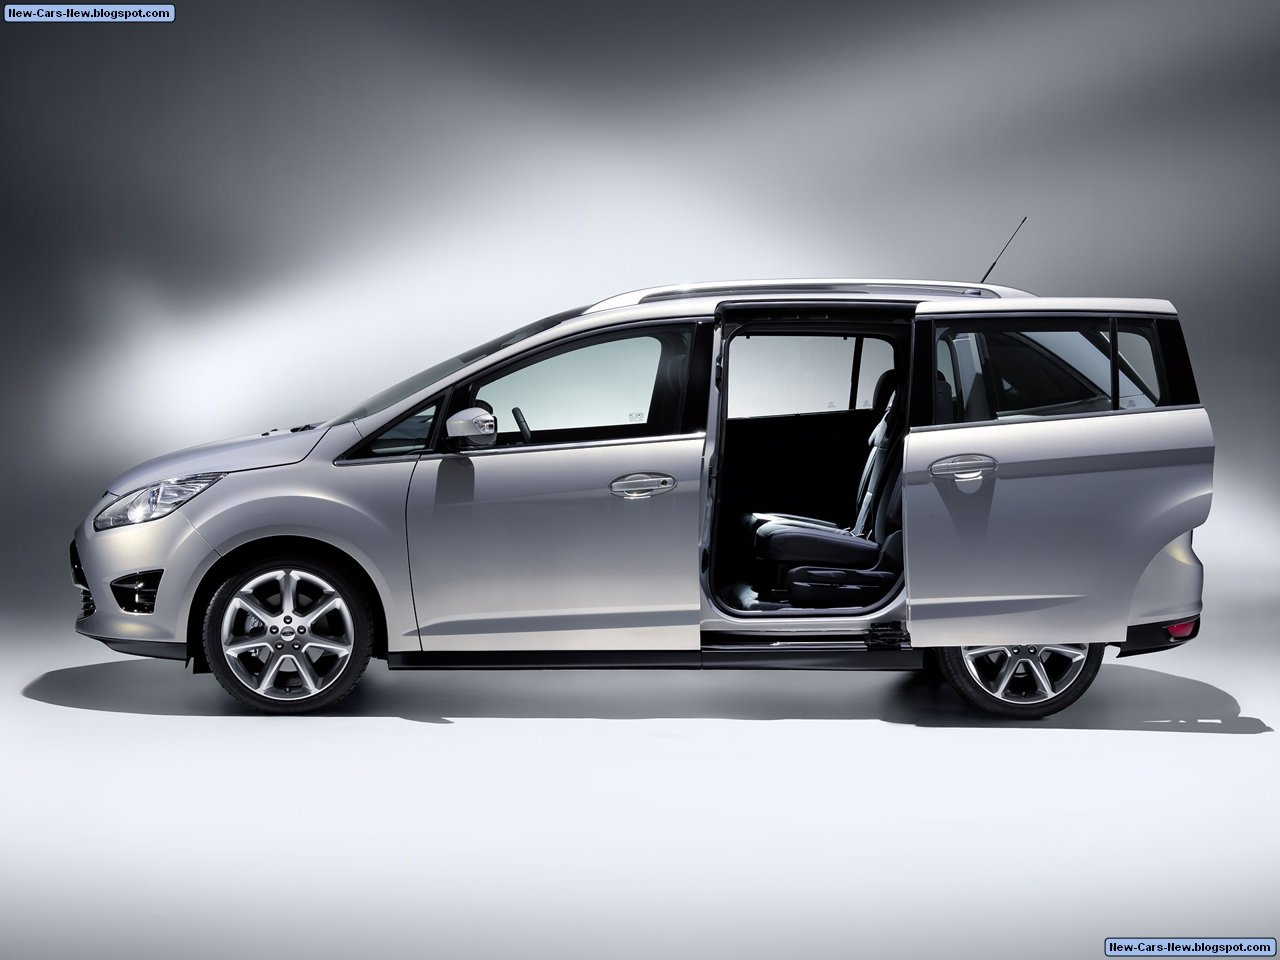 http://2.bp.blogspot.com/_U4w592tUDHM/TCBu1PWzkWI/AAAAAAAACTY/udcDY1eXWuo/s1600/Ford-Grand_C-MAX_2011_1280x960_wallpaper_03.jpg